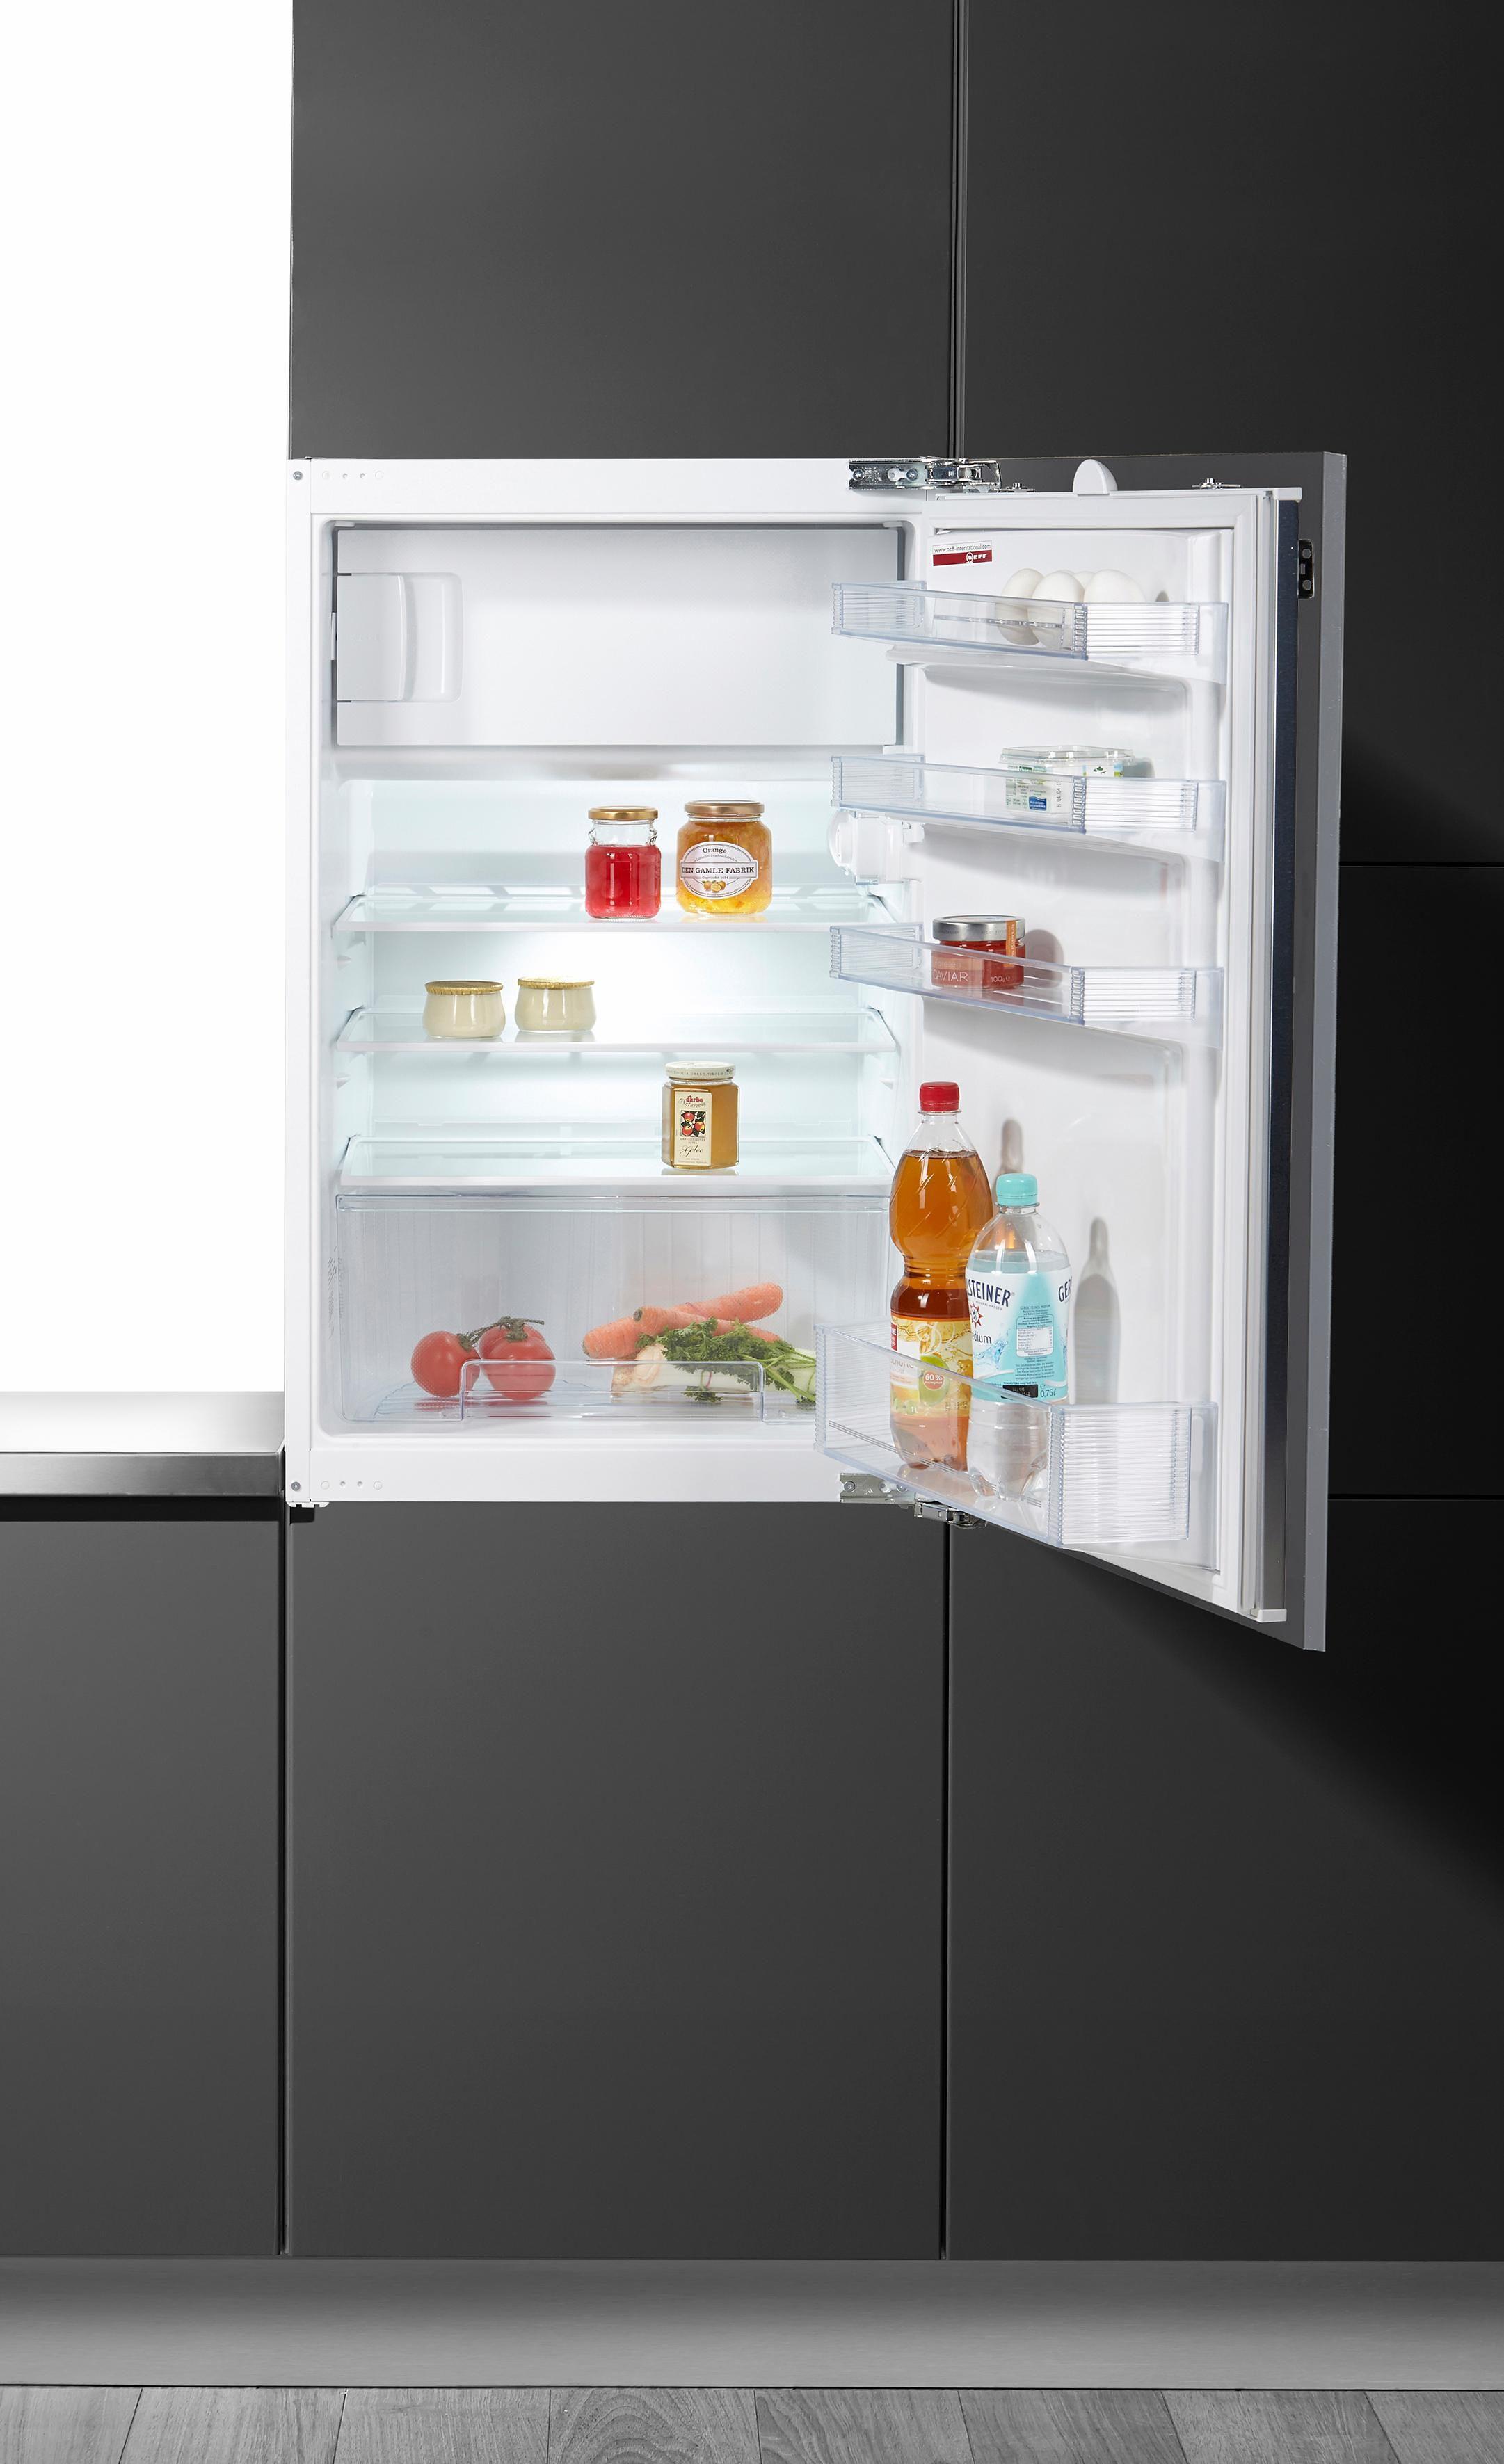 Neff Integrierbarer Einbau-Kühlschrank K 225 A1, A+, 87,4 cm hoch